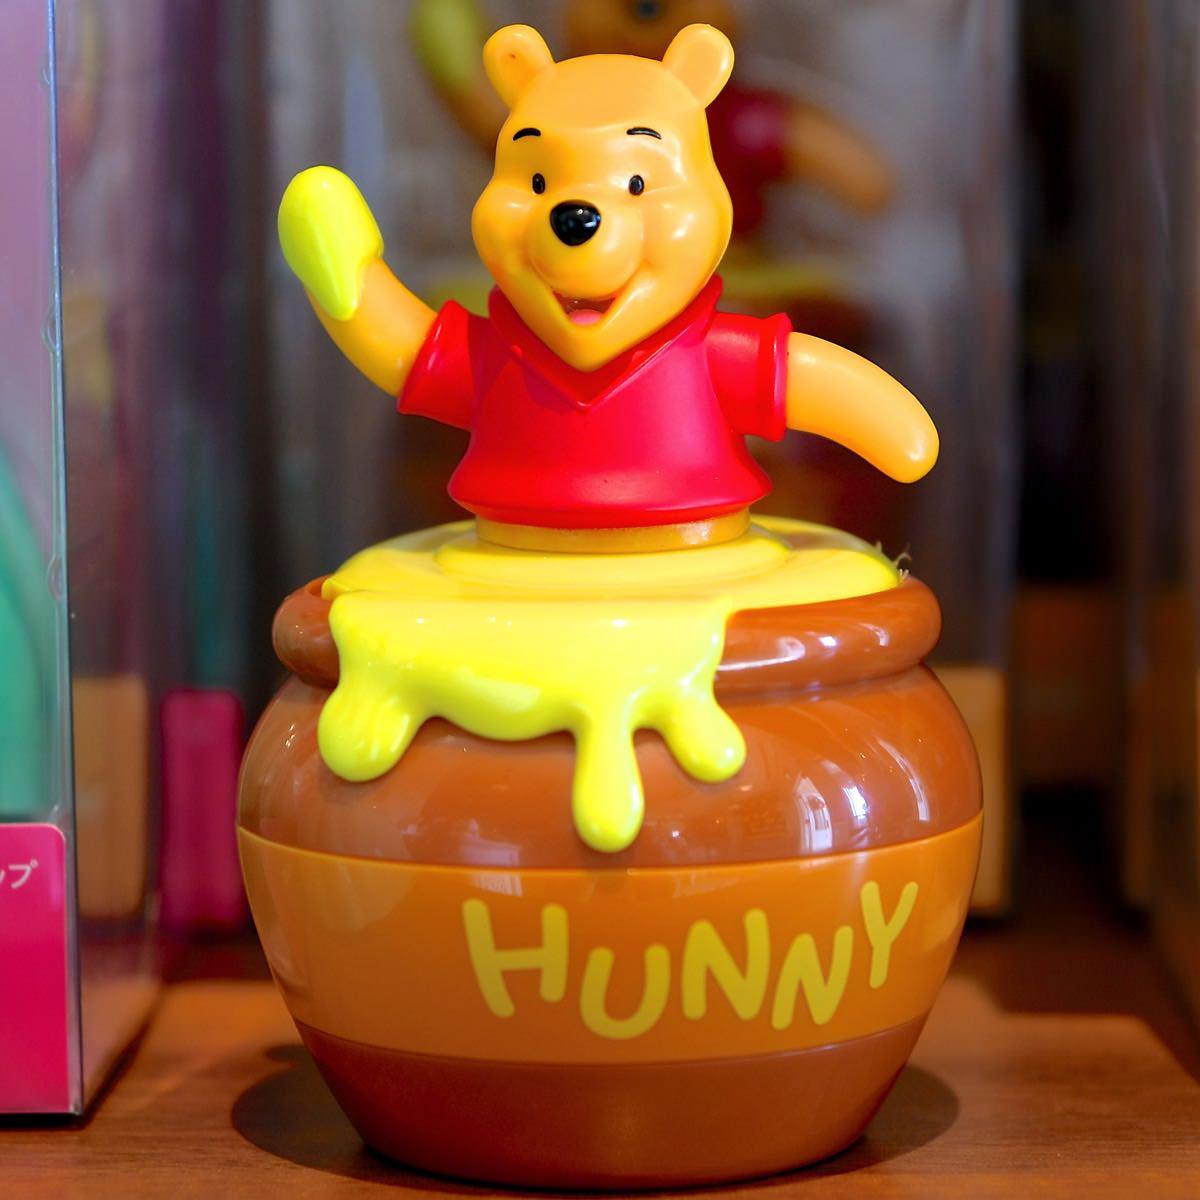 X射線【C108003】日本東京迪士尼代購-小熊維尼Winnie the Pooh 鍵盤除塵擺飾,吸塵器/小掃把掃帚/辦公桌面清潔/浴室地板/鍵盤刷